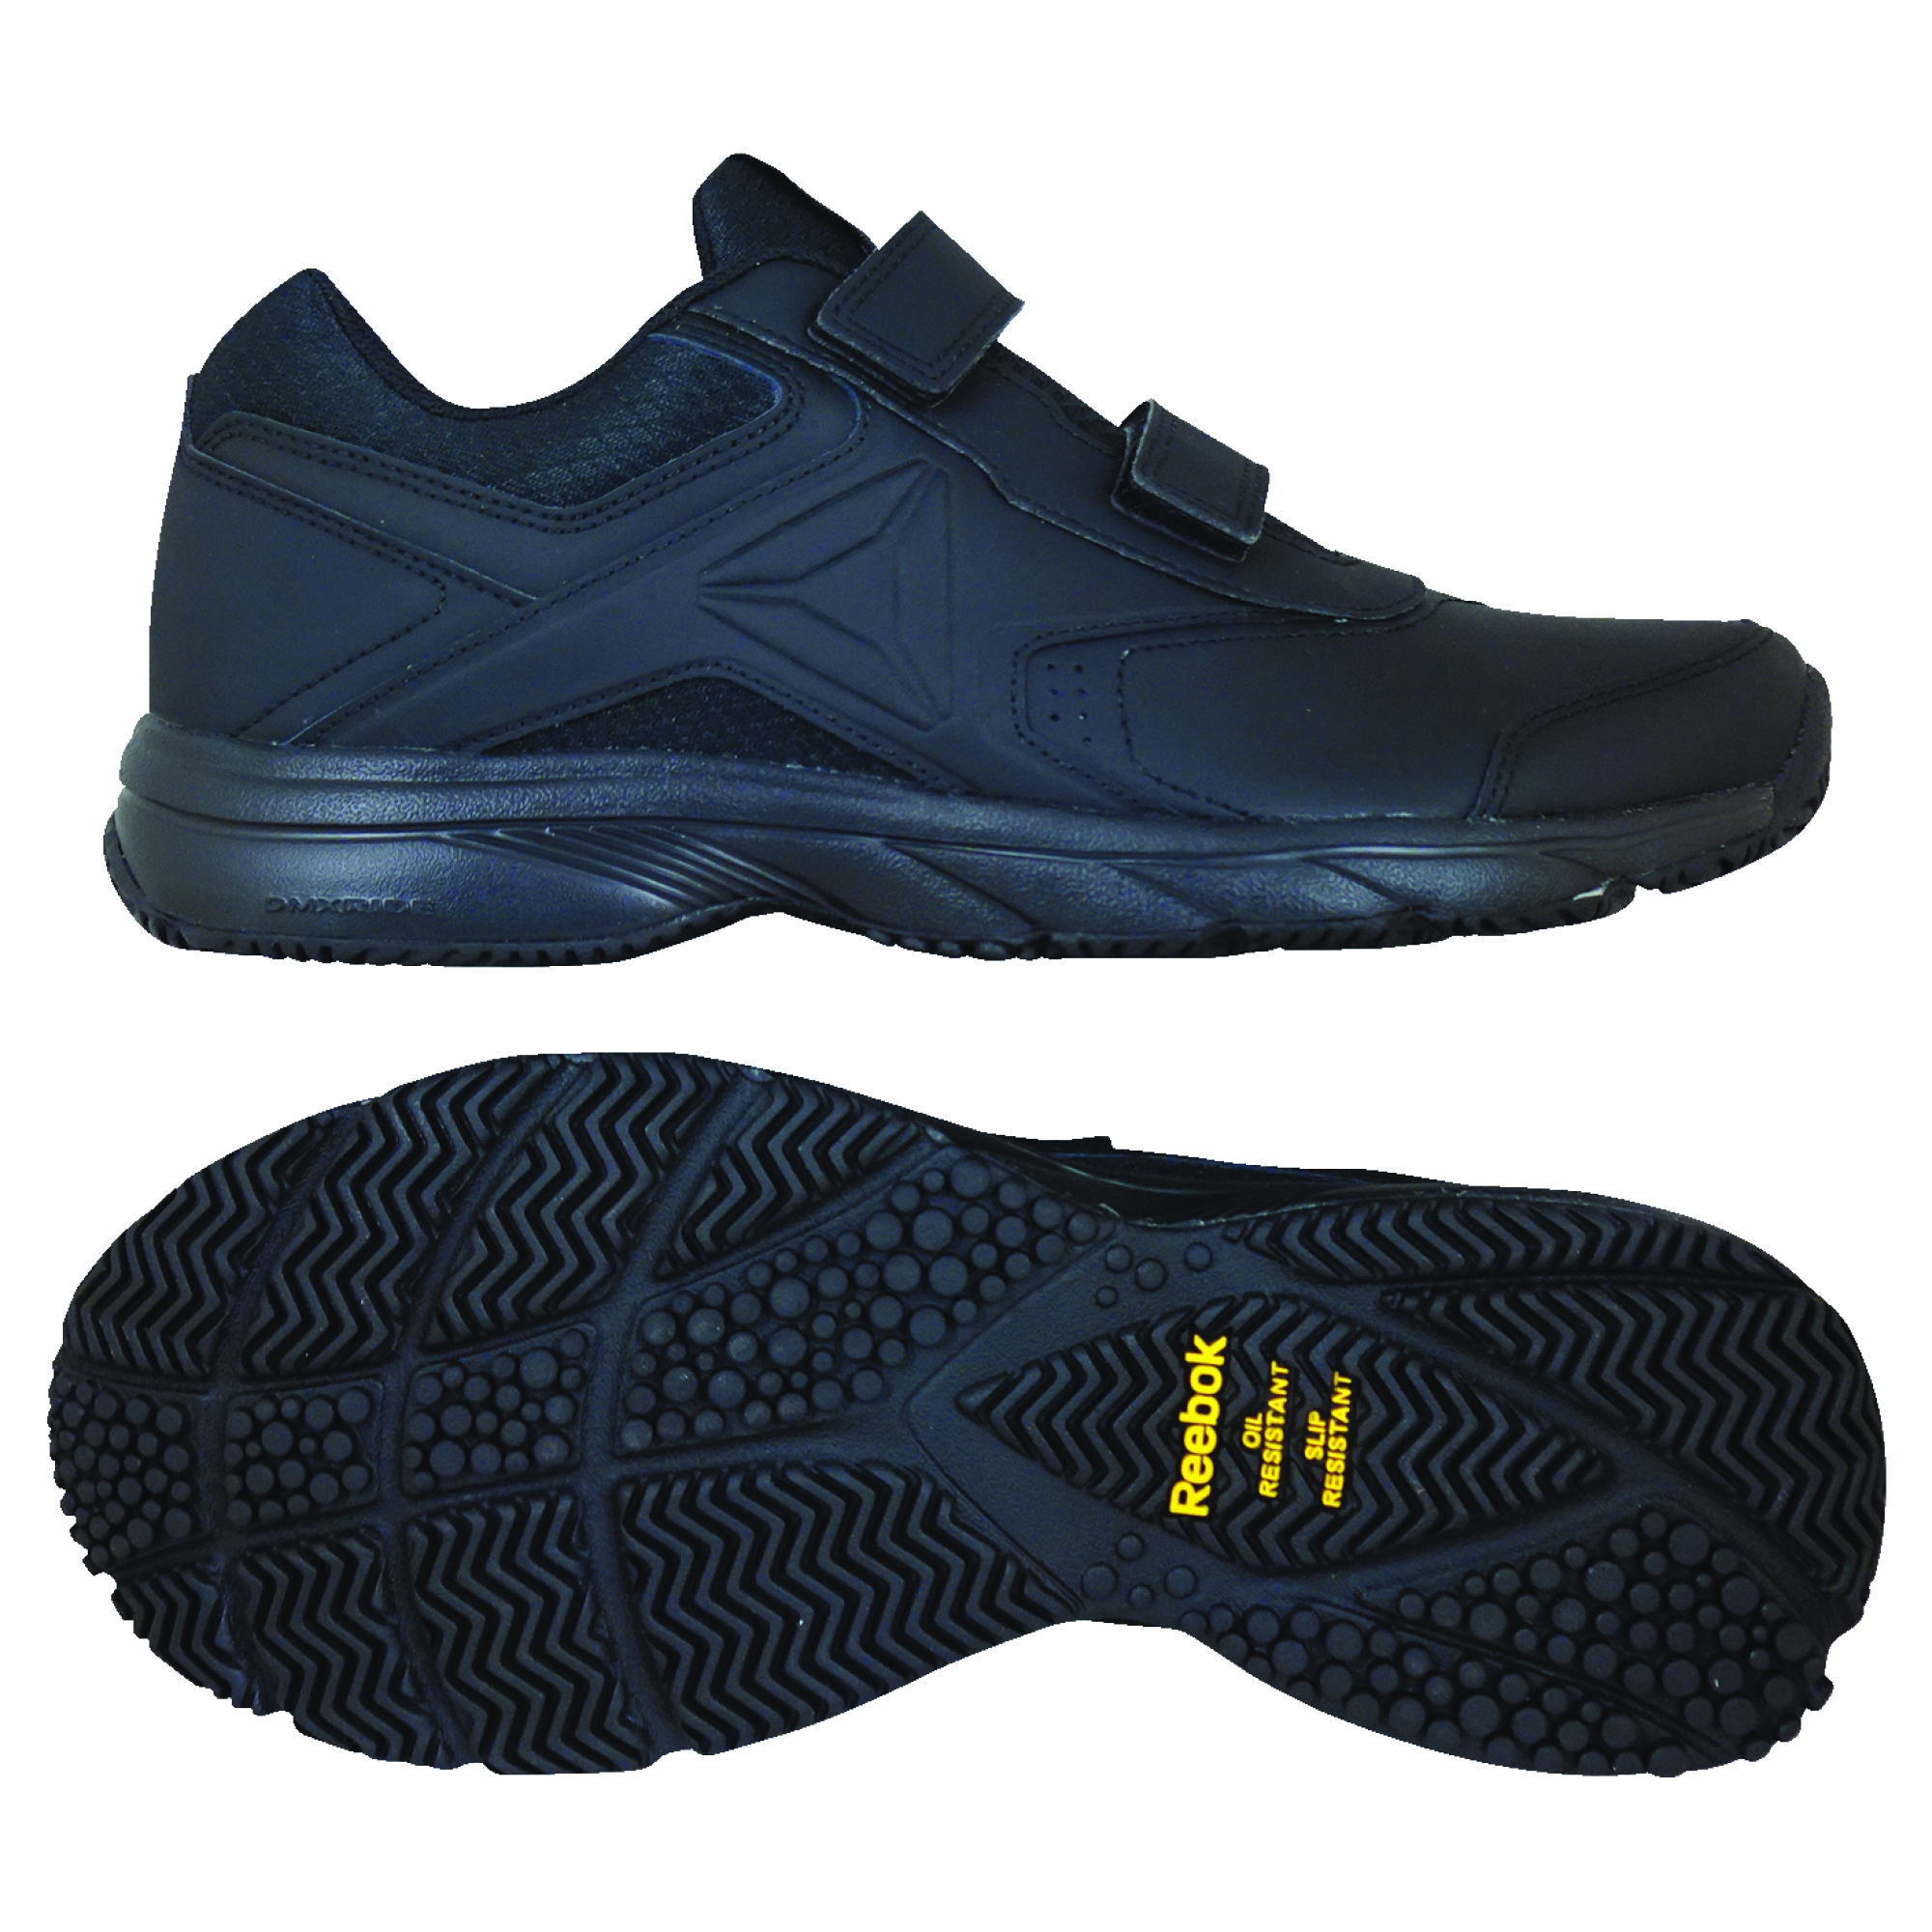 f5066852d48f Chaussures femme Reebok Work N Cushion 3.0 KC